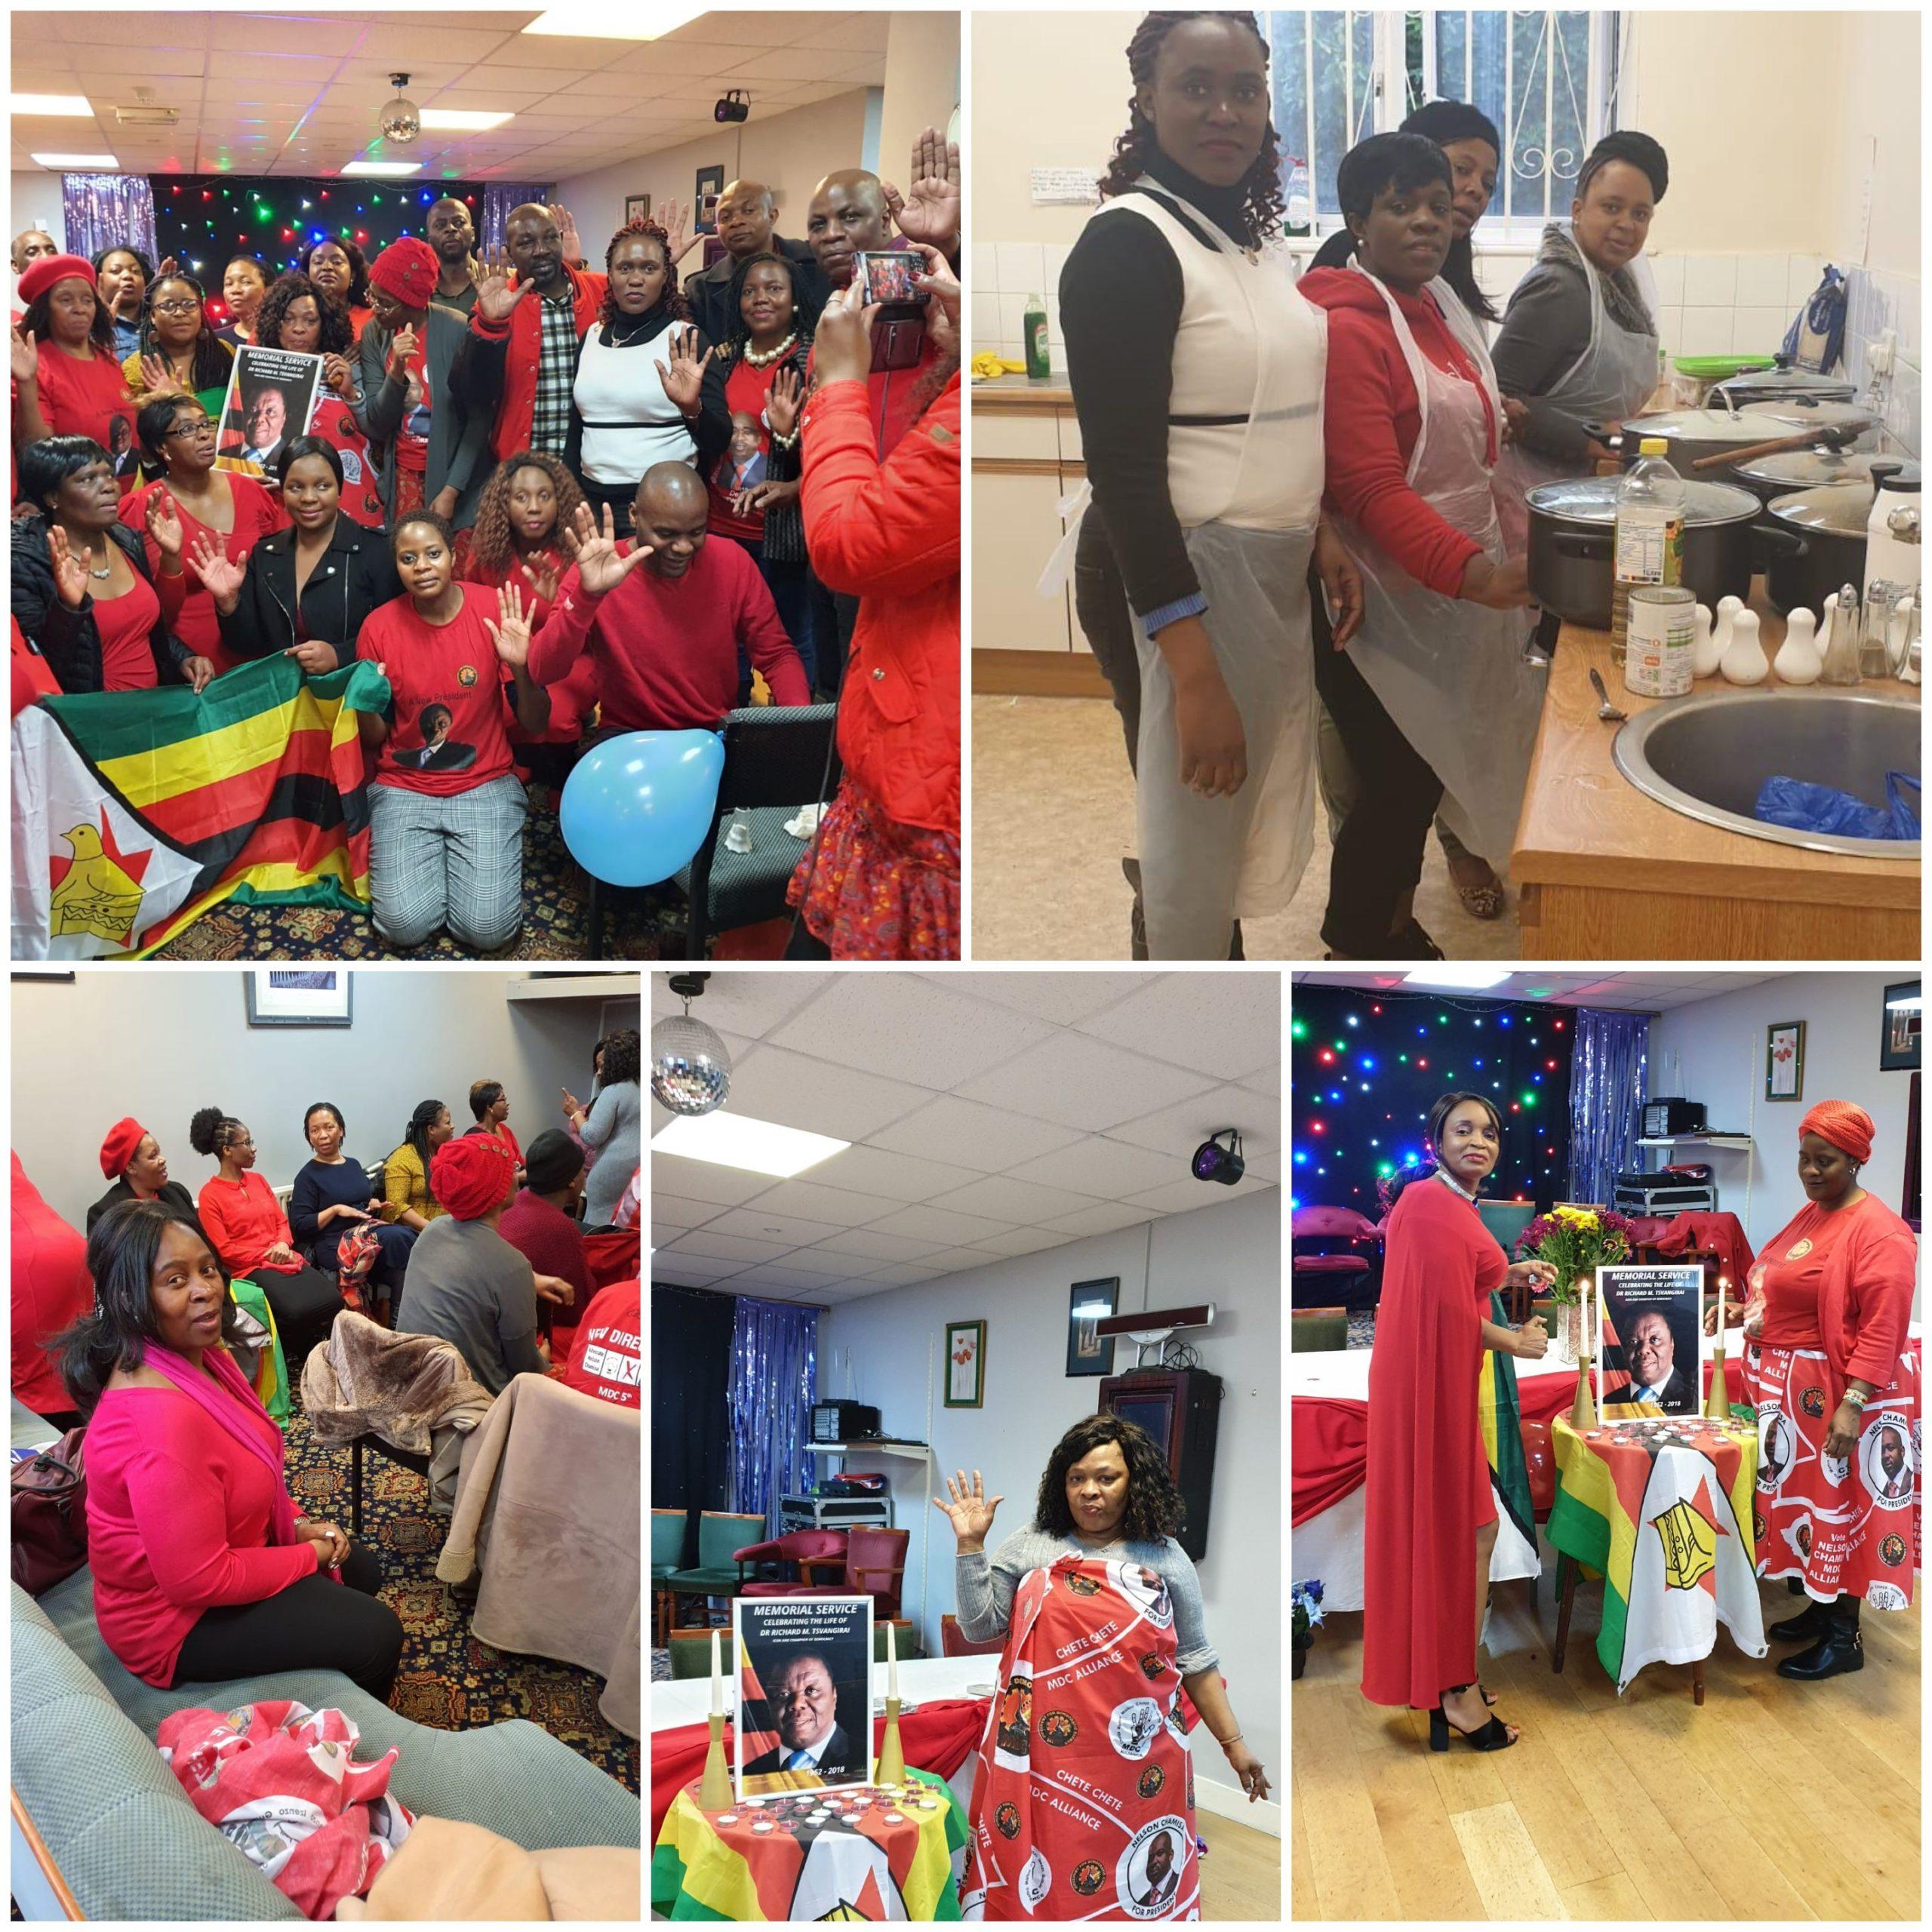 MDC UK & Ireland commemorates memorial service for the late Dr Morgan Tsvangirai, Saturday 15 February,  London